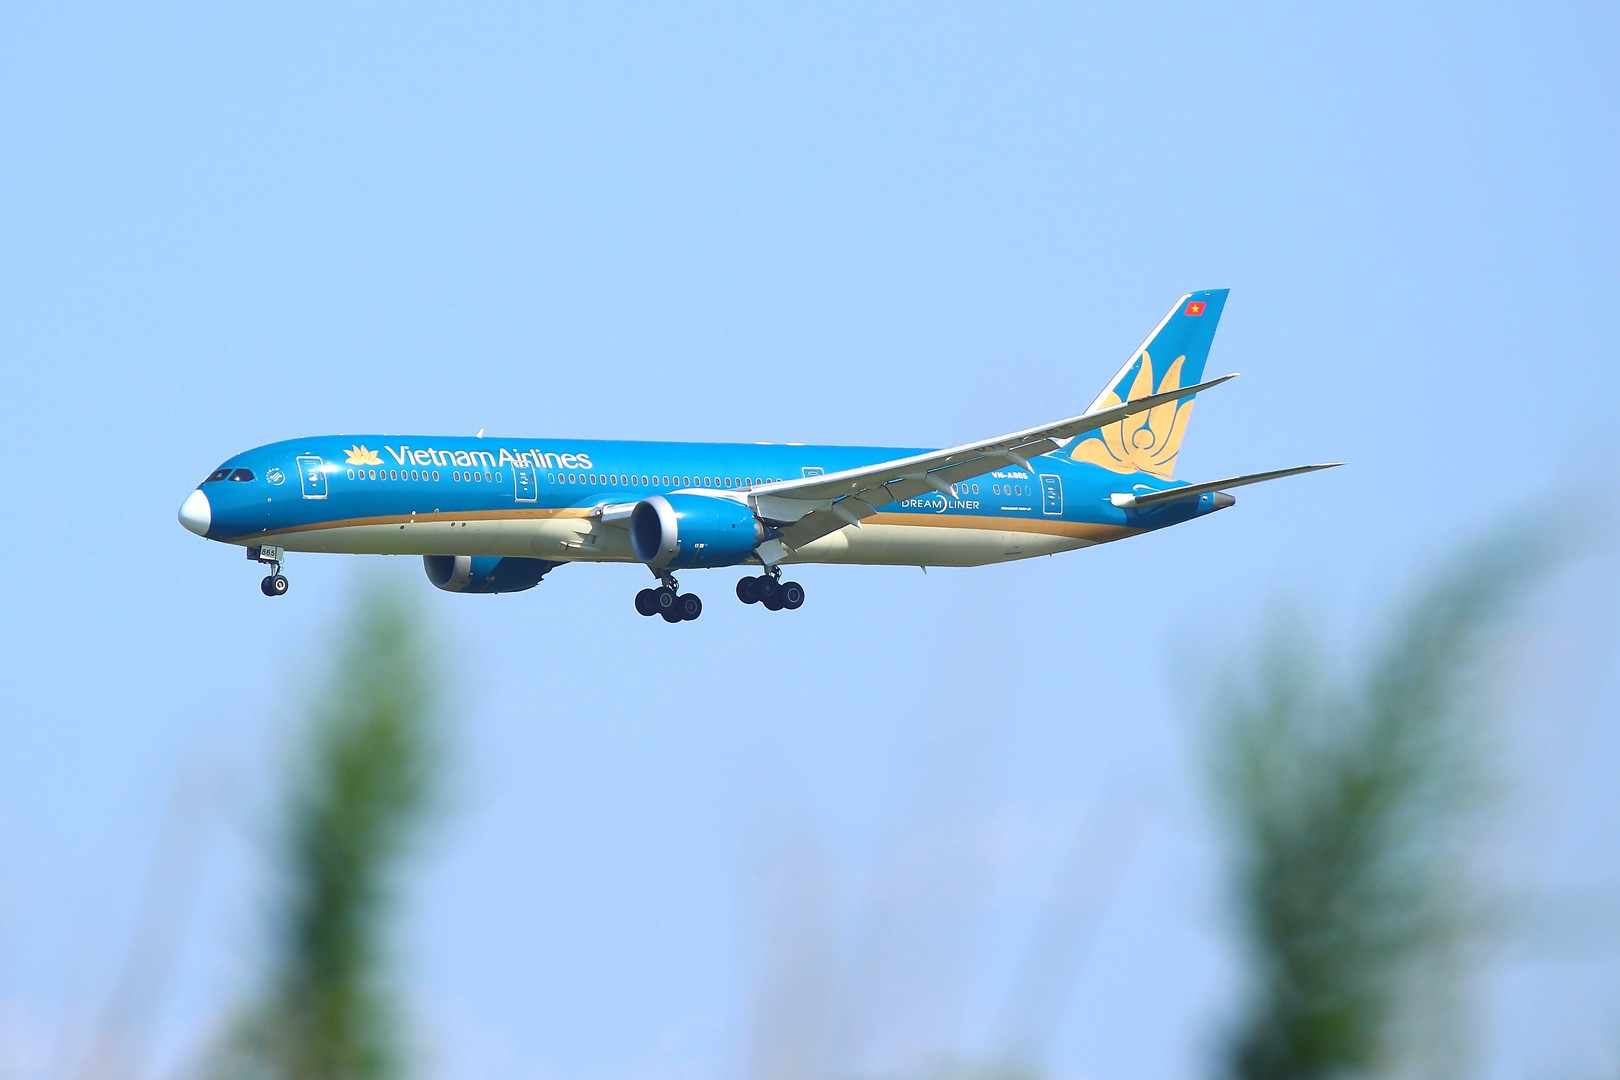 Re:[原创]转季转风向,觅PVG南端 BOEING 787-8 VN-A865 中国上海浦东国际机场